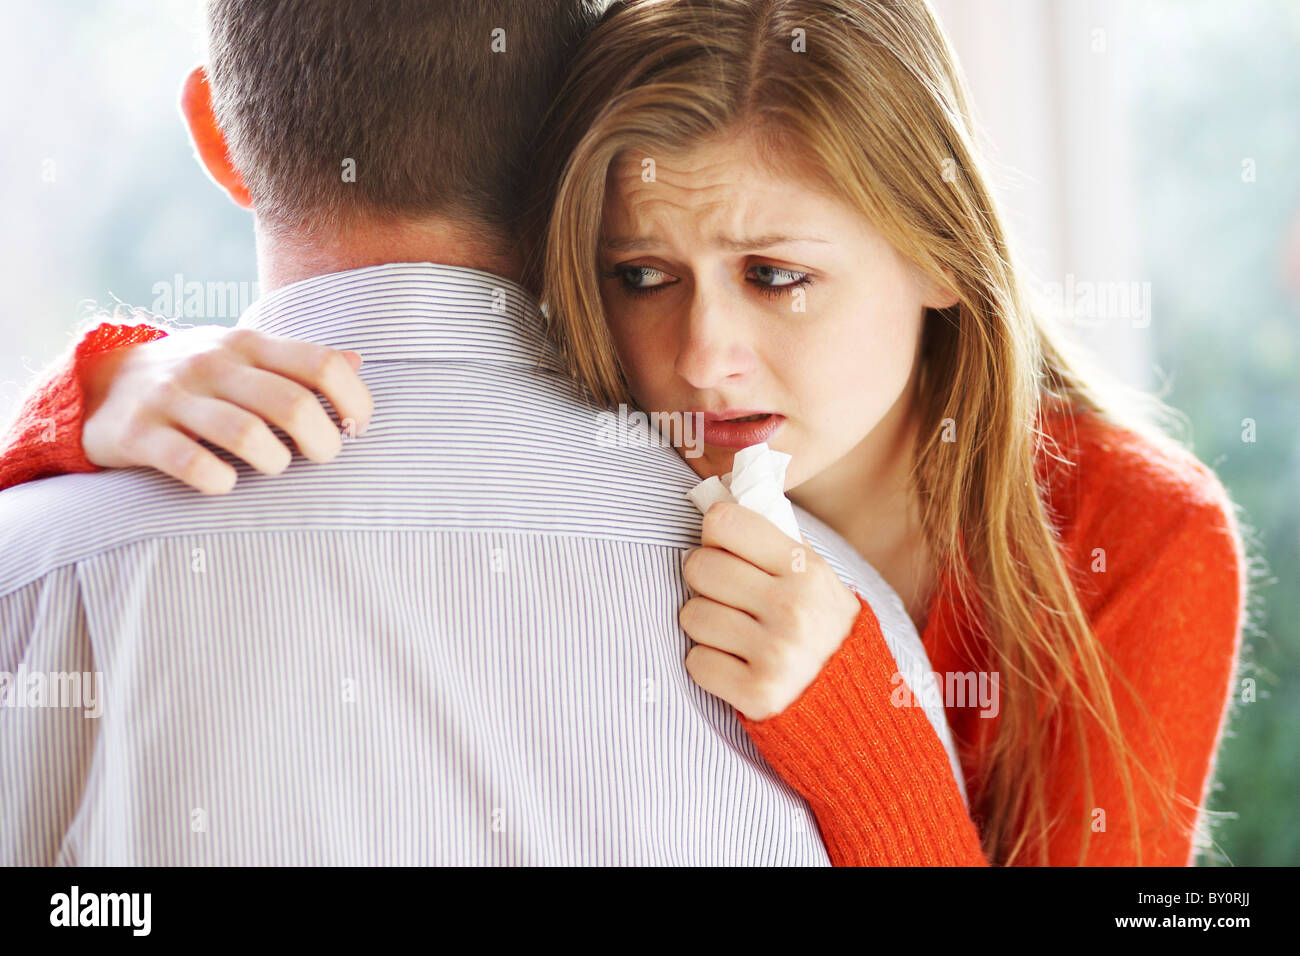 Couple hugging - Stock Image